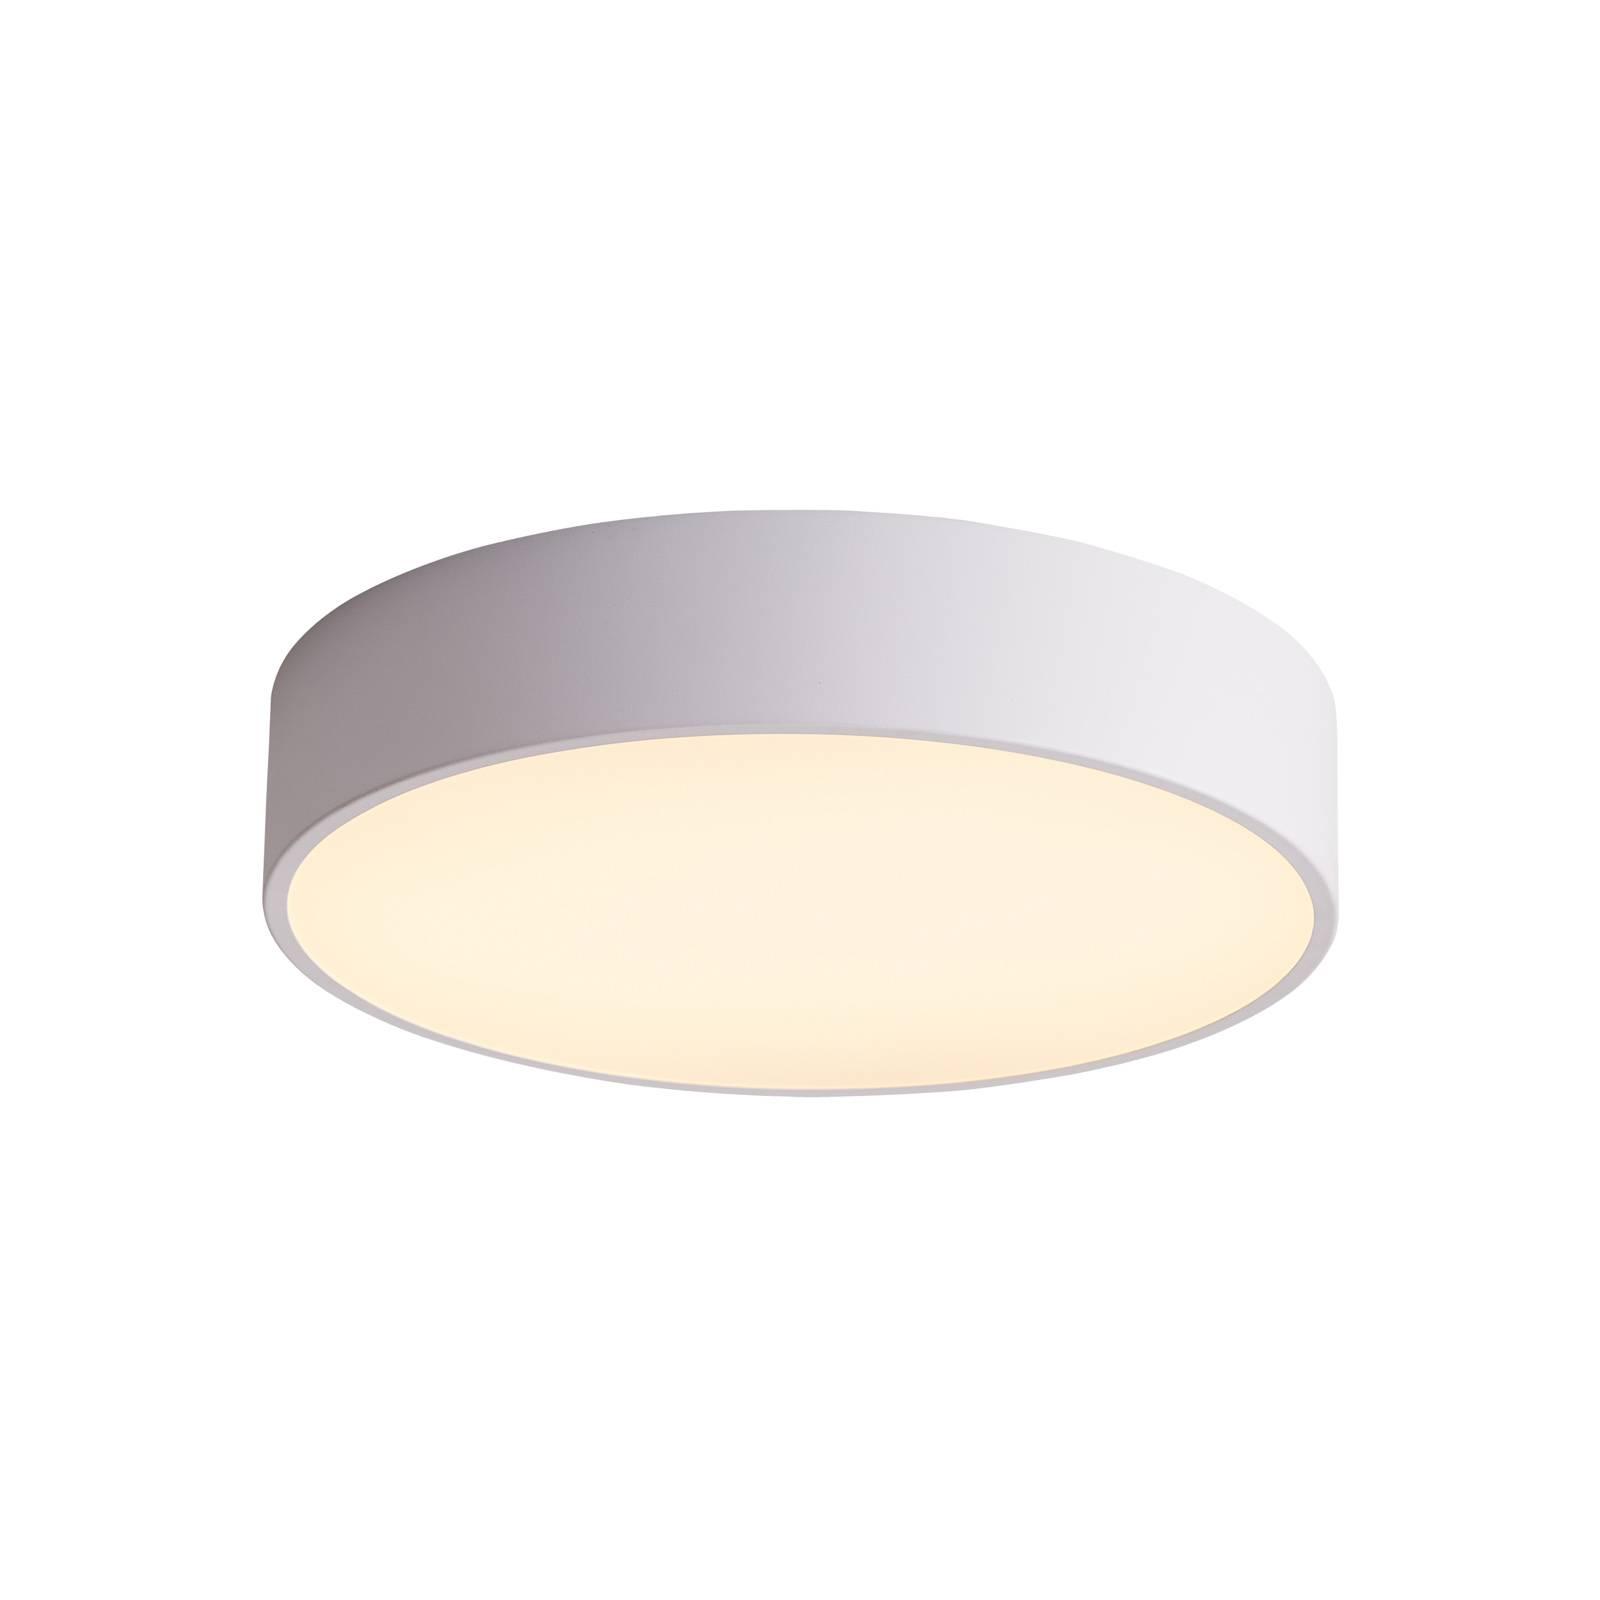 Arcchio Noabelle -LED-kattovalaisin, 80 cm